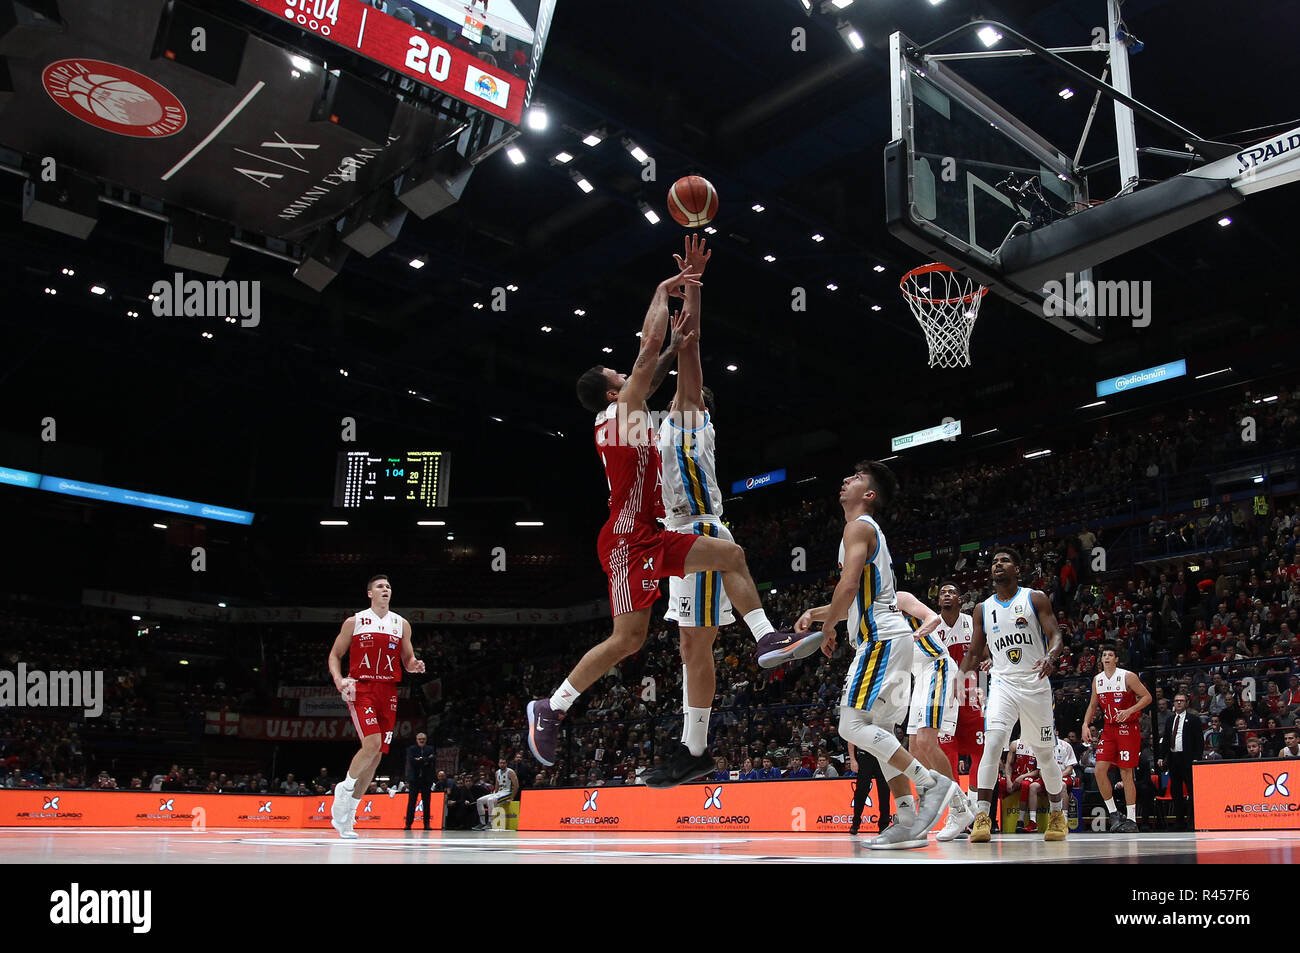 4c3bfc15ac3 Italy, 25 novembre 2018 Assago (MI) Italia sport basket AX Armani Exchange  Olimpia